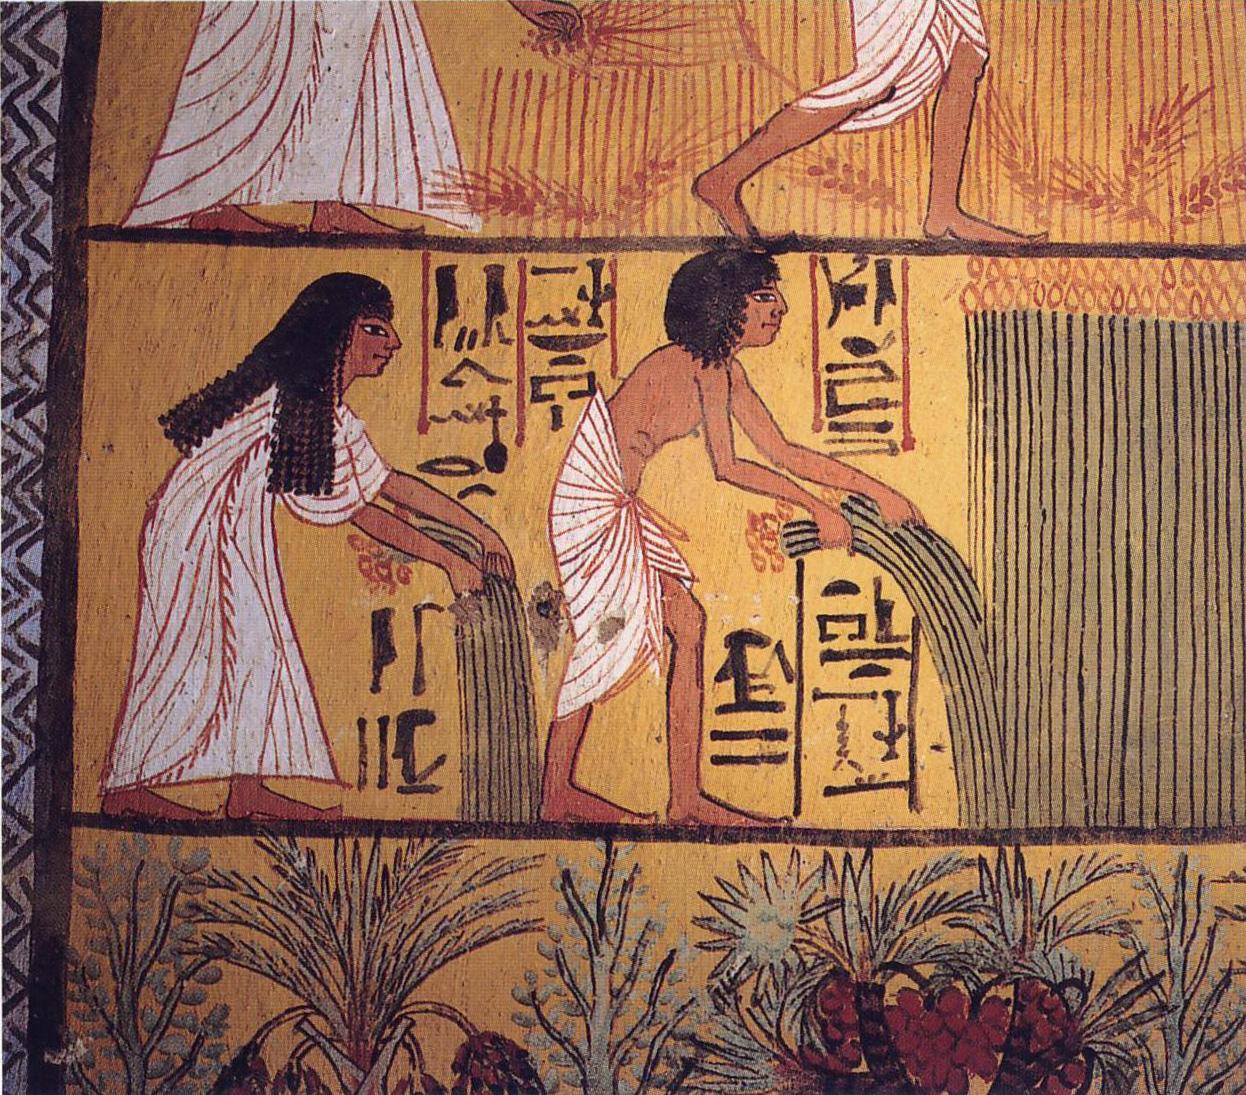 https://i2.wp.com/upload.wikimedia.org/wikipedia/commons/a/ae/Egyptian_harvest.jpg